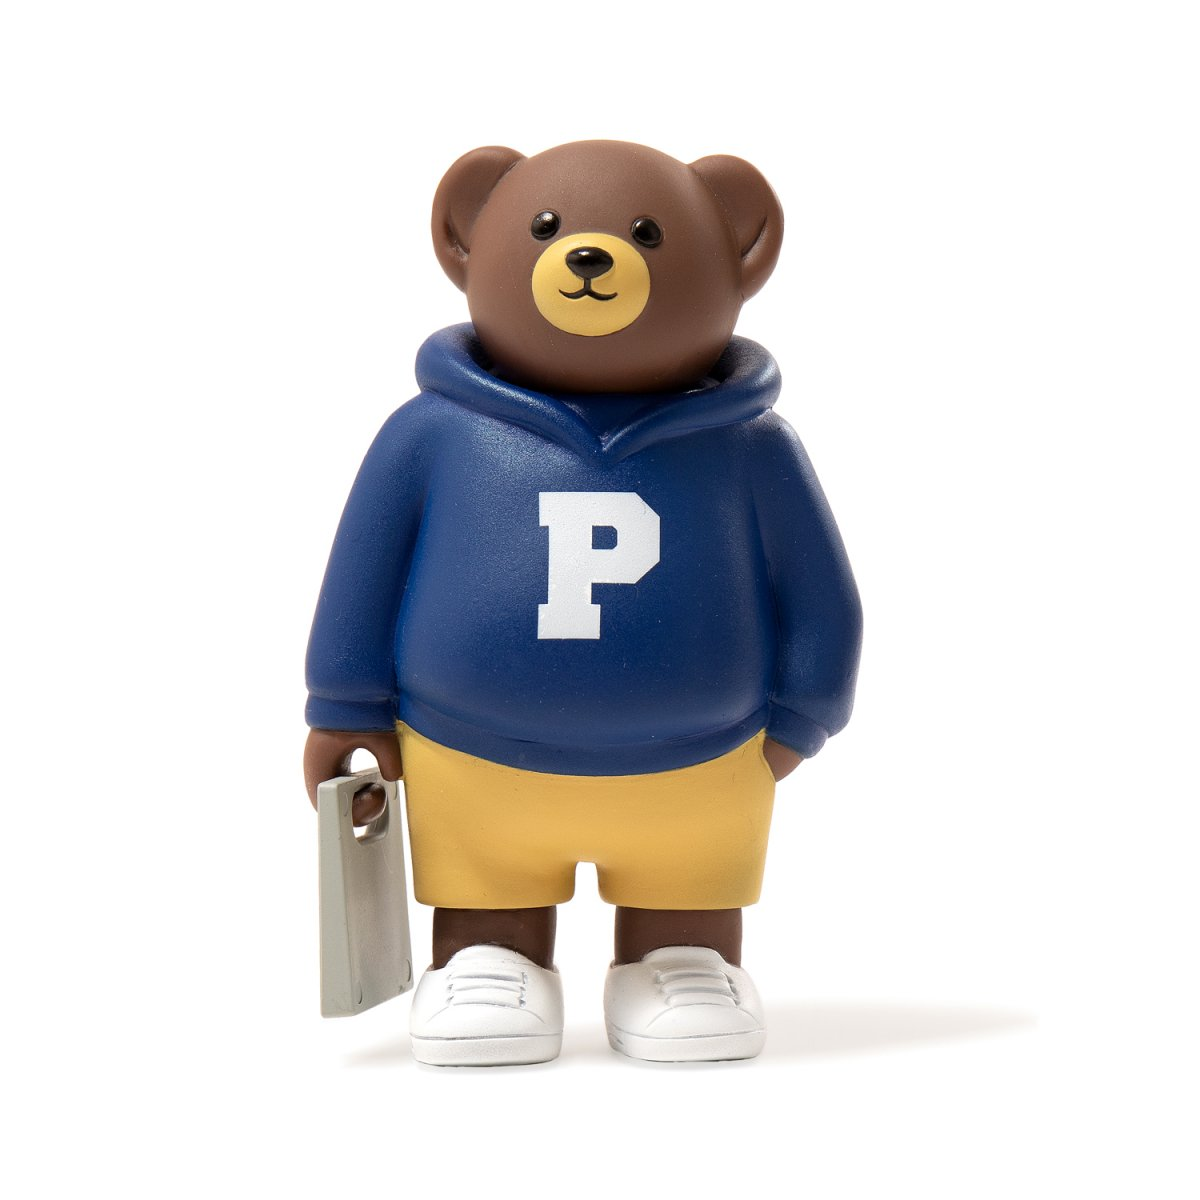 "【Knick Knacks】Wicked Bear ""P""                           </a>             <span class="